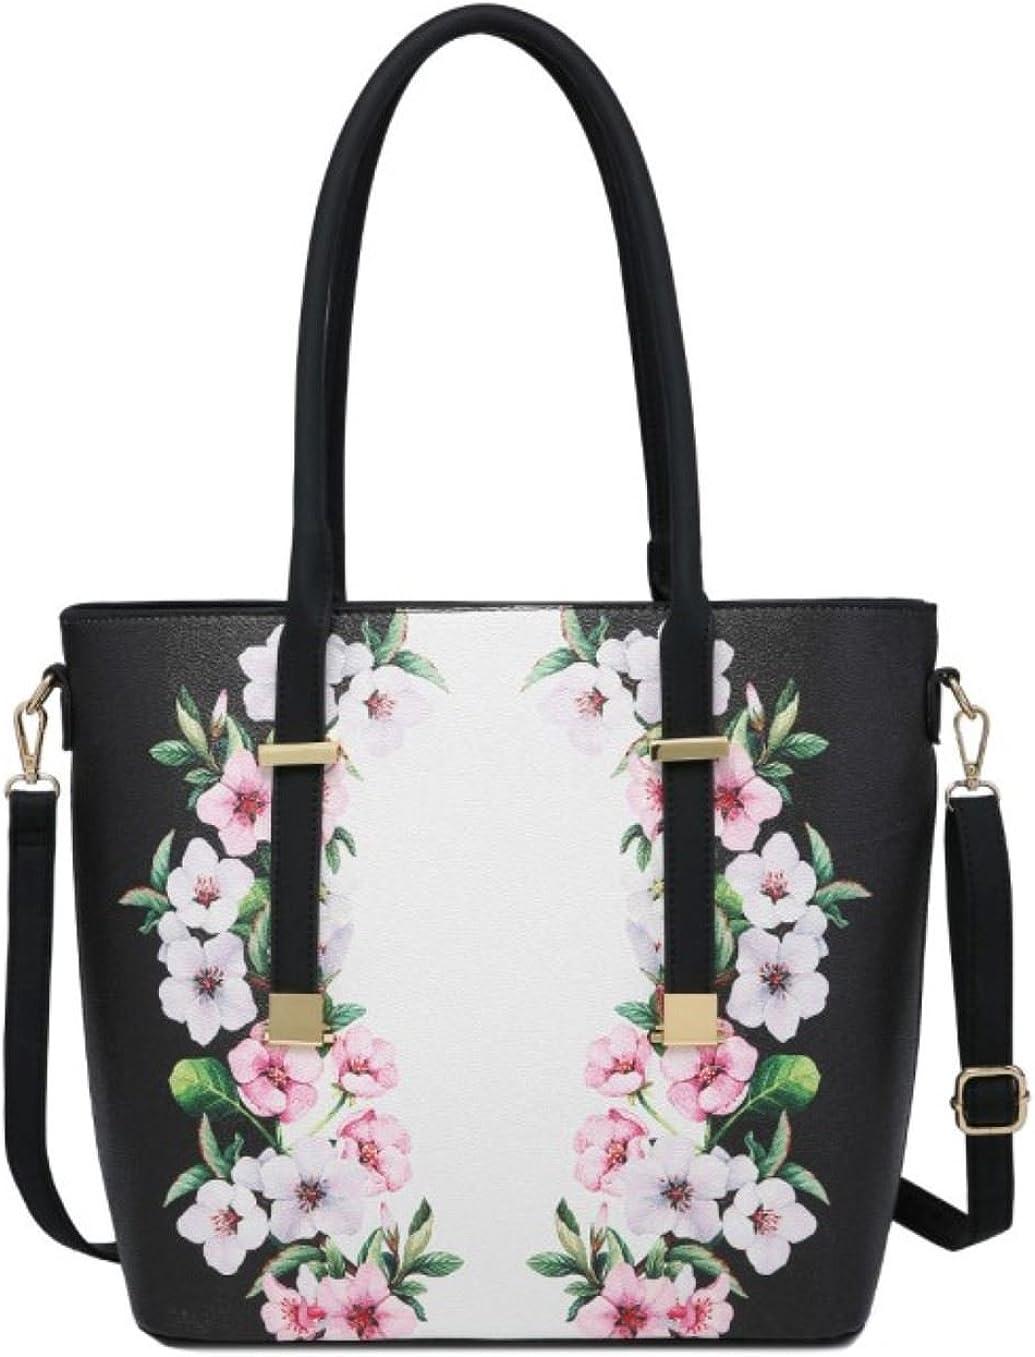 Girly Handbags Flowers Print Top Handle Bag